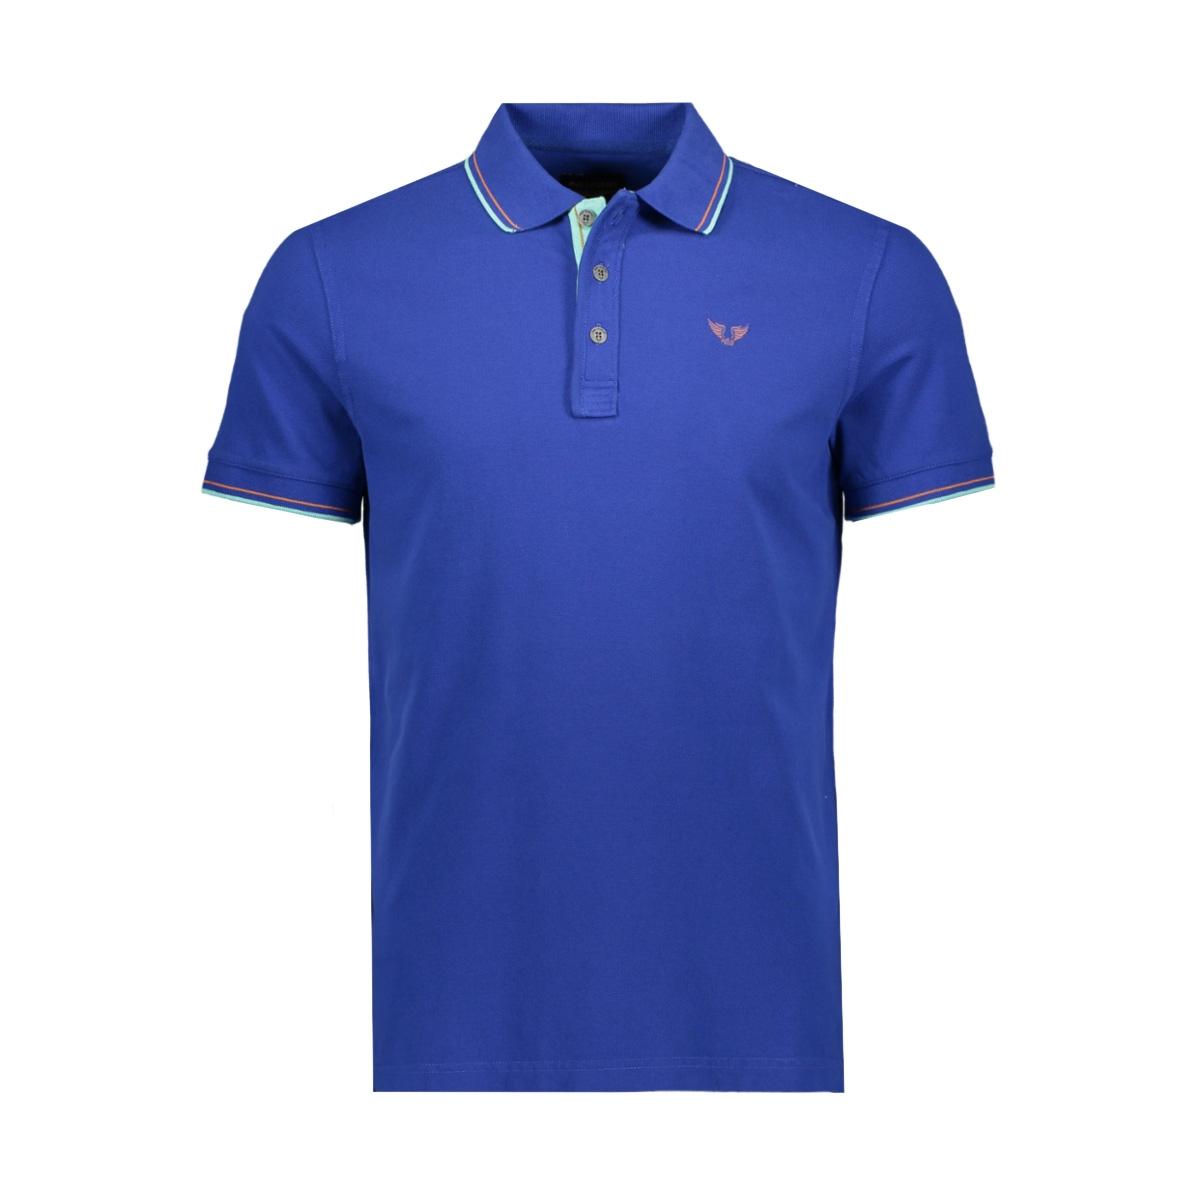 short sleeve polo ppss194869 pme legend polo 5090